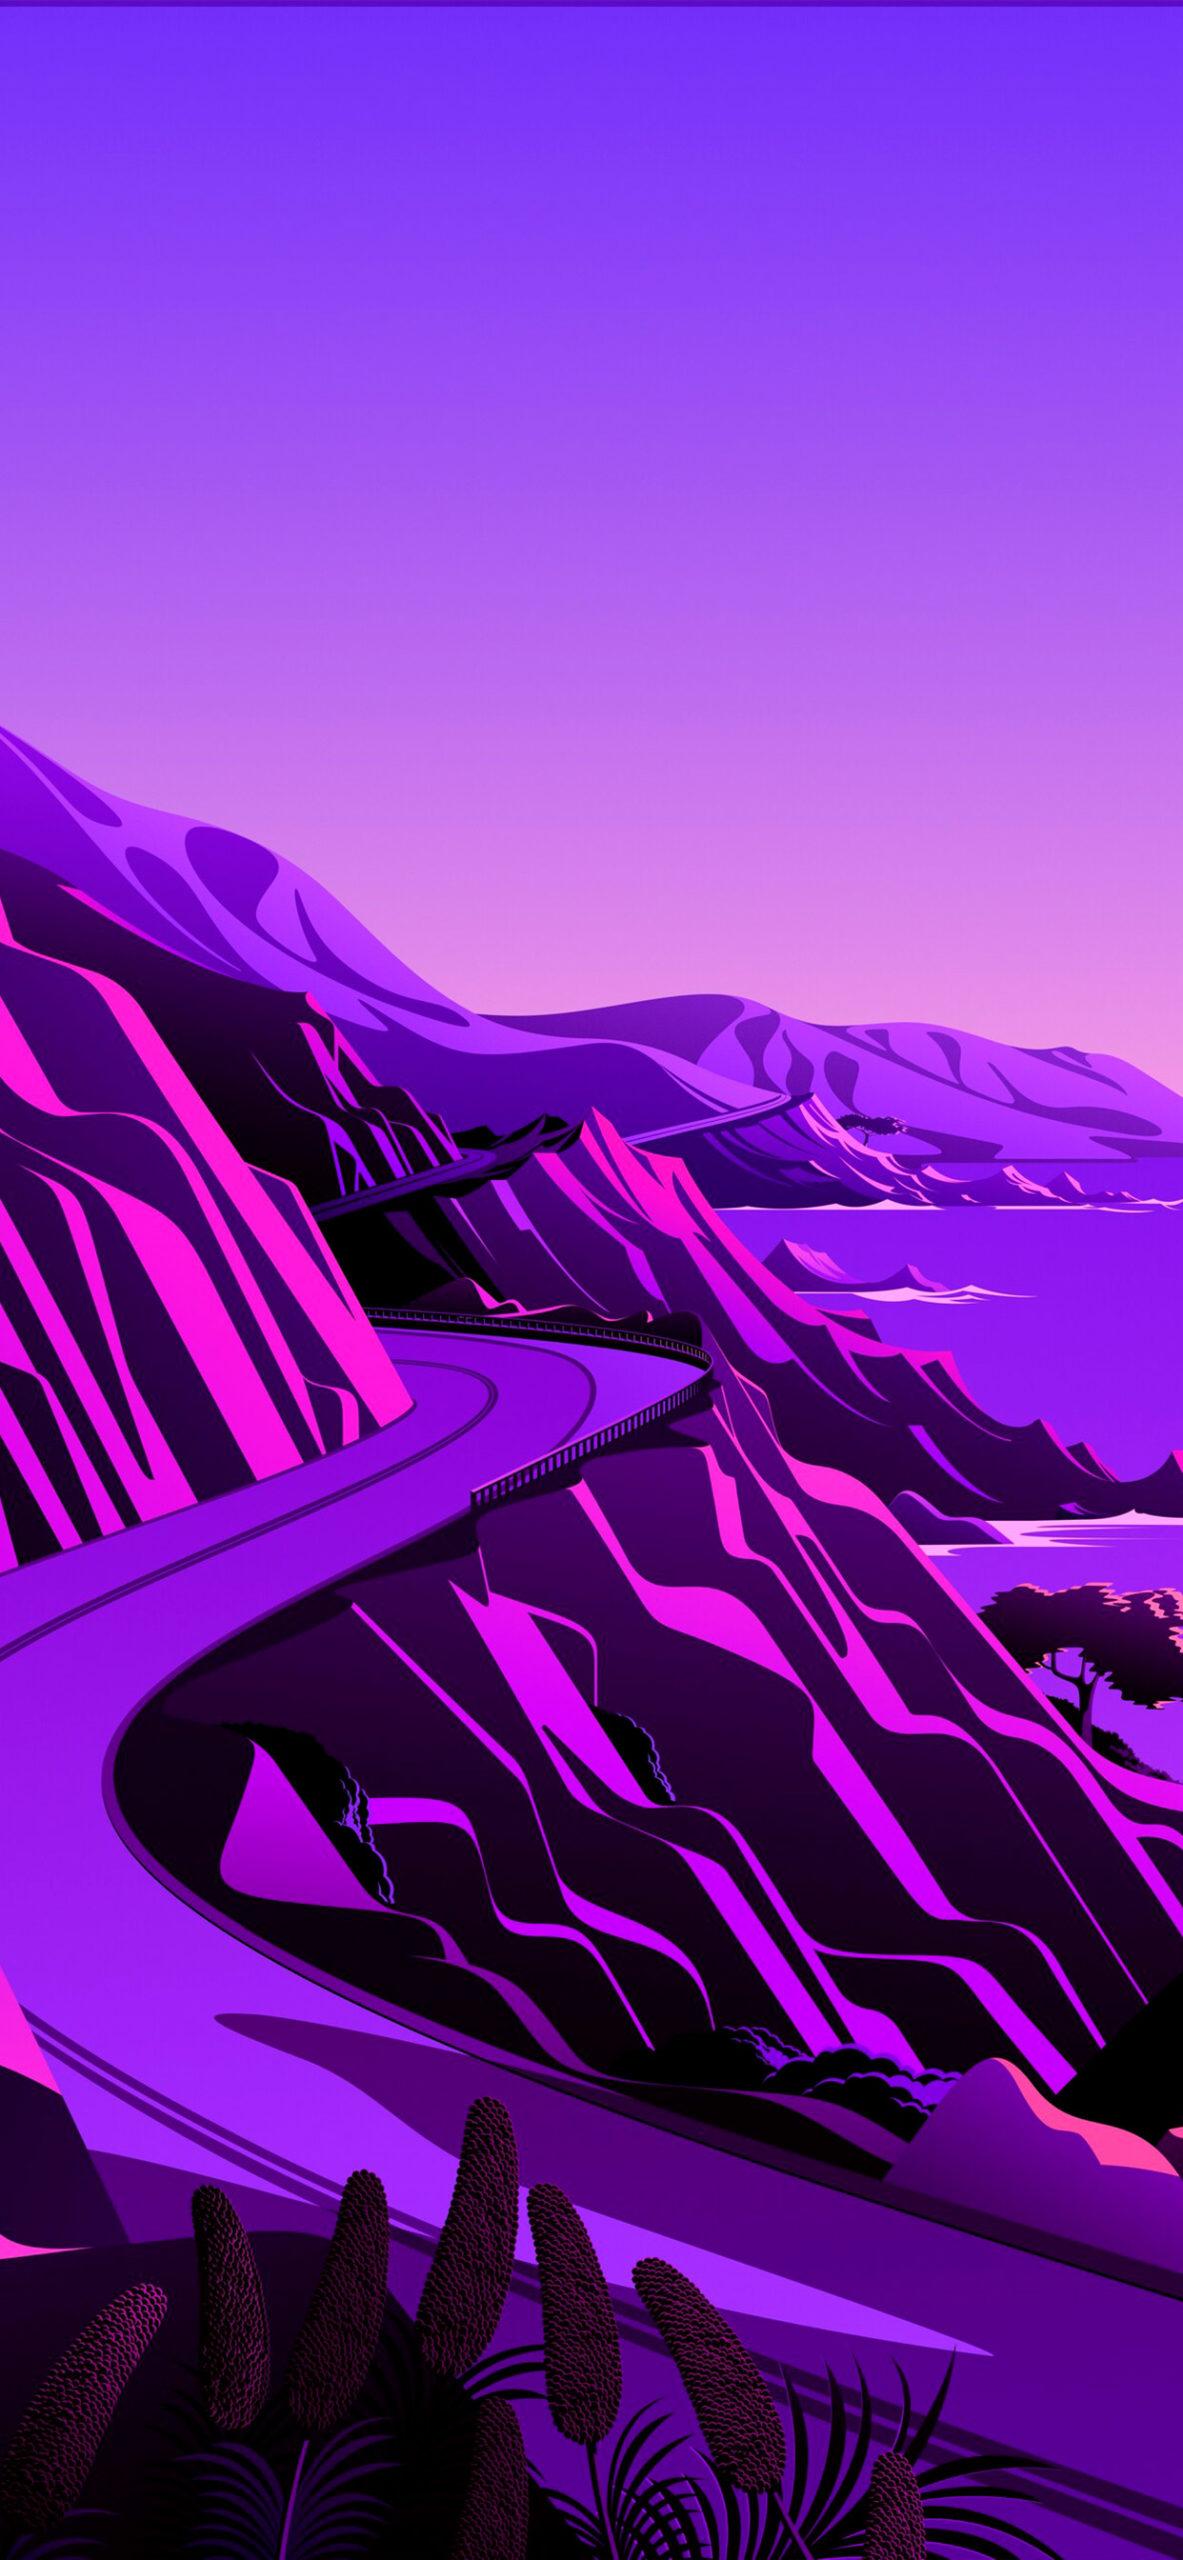 iphone wallpaper big sur cliffs1 scaled Mac OS Big Sur (Cliffs)